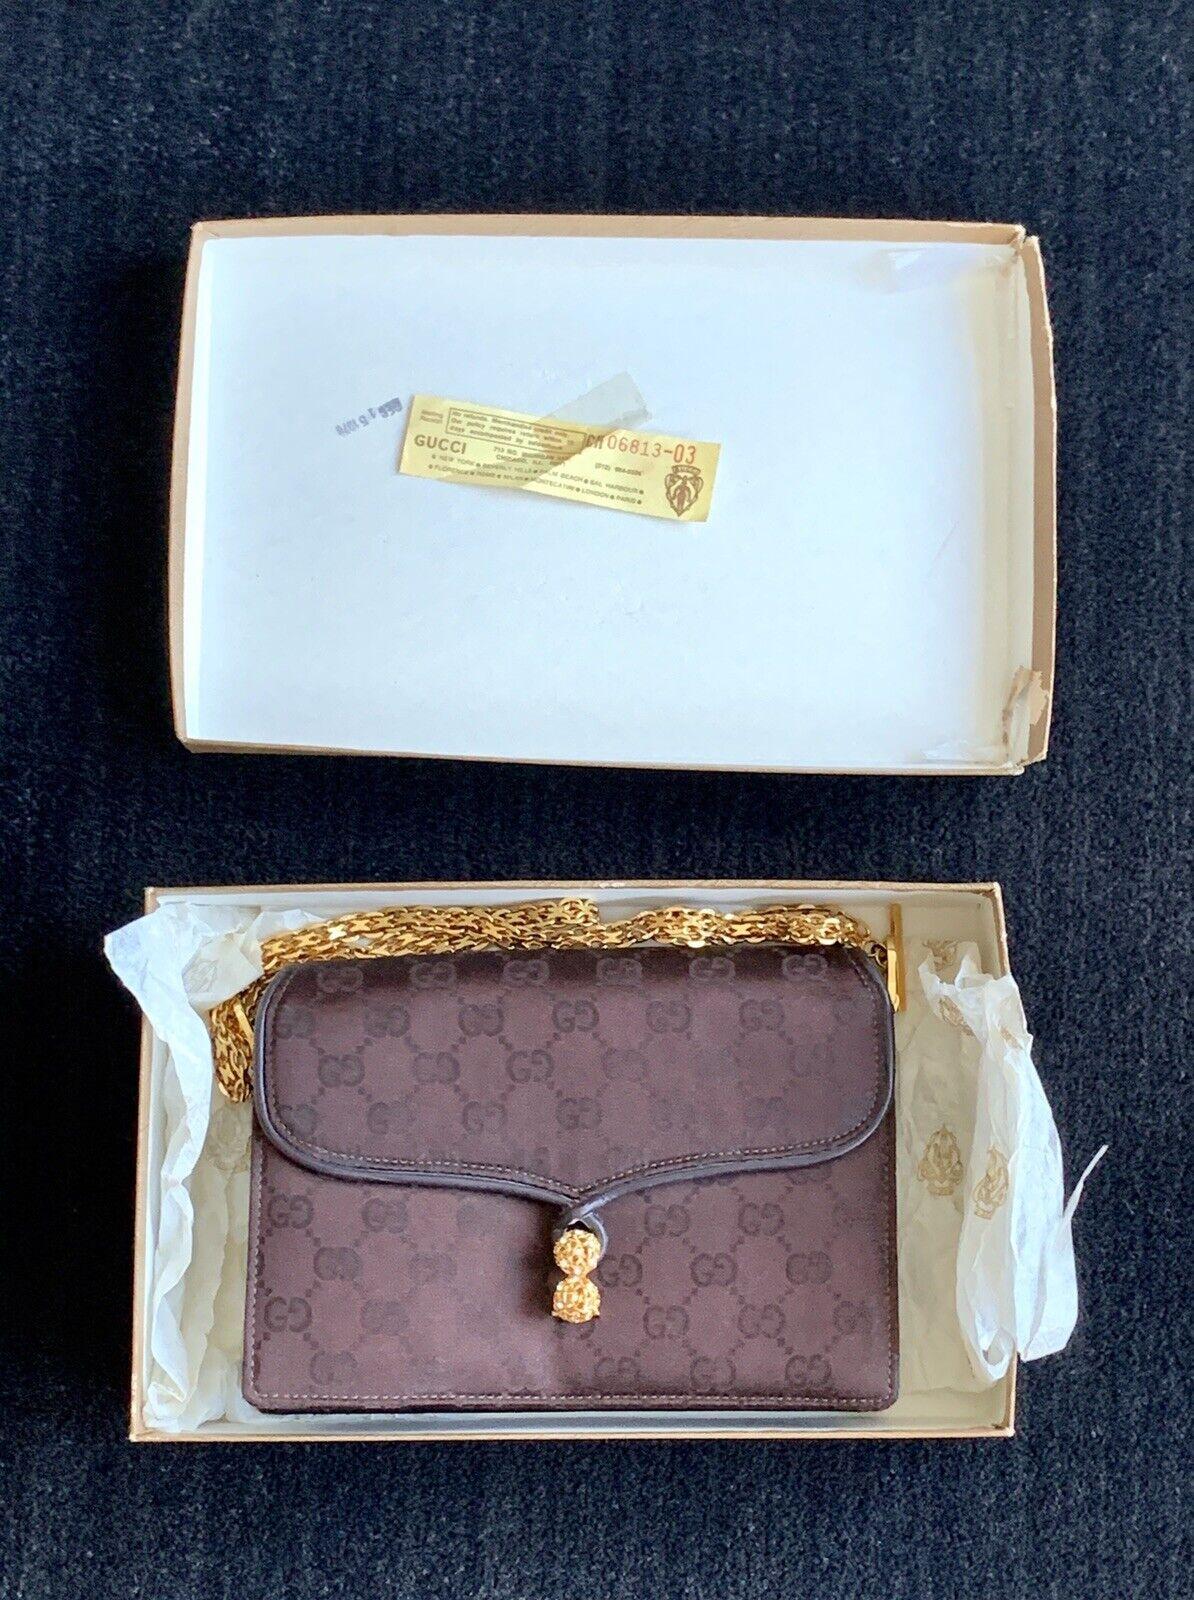 Gucci Vintage Classic Handbag with original box  - image 1